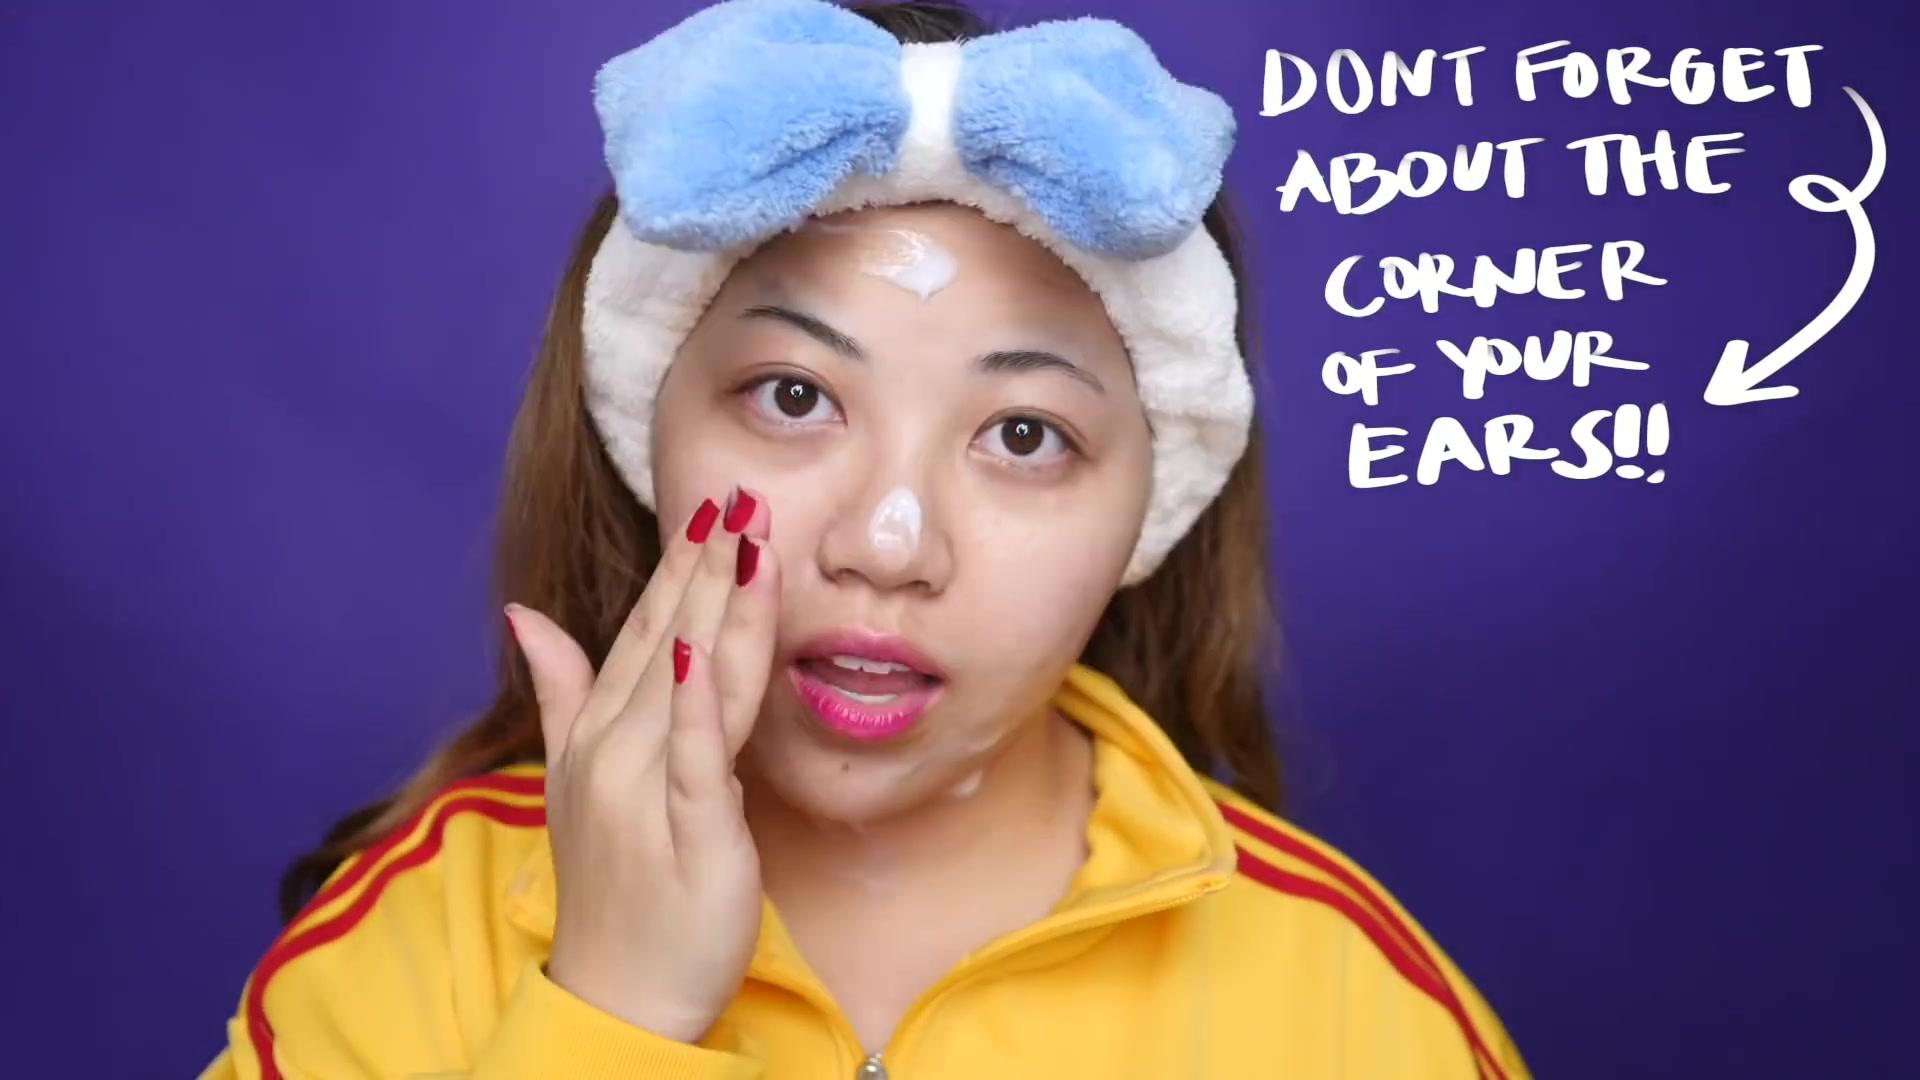 heyitsfeiii Episode 153: How to Get GLASS SKIN for Acne Skin!